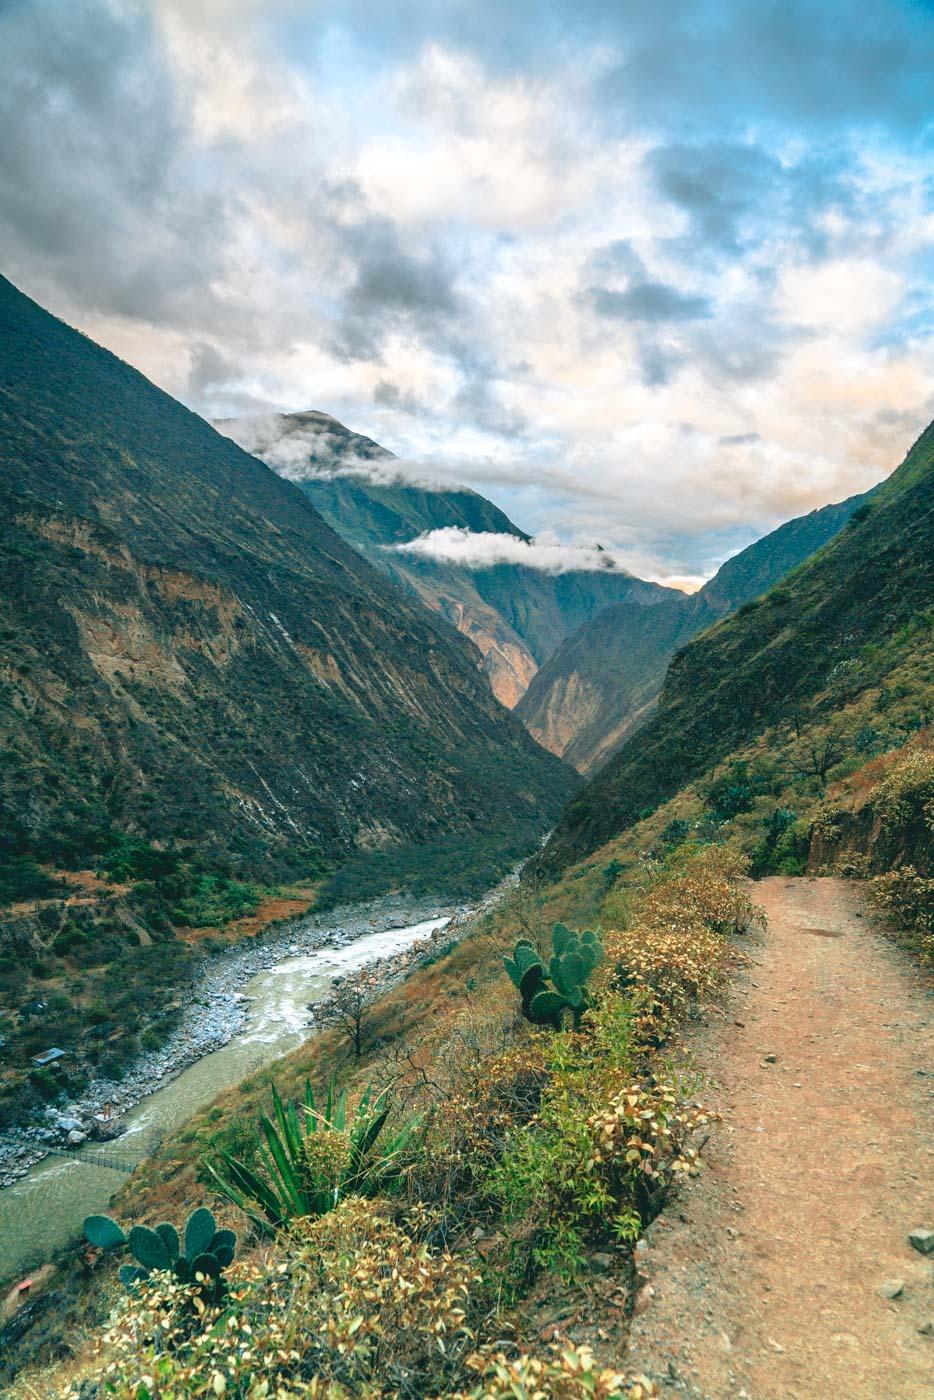 Apurimac Valley, Cusco region, Peru